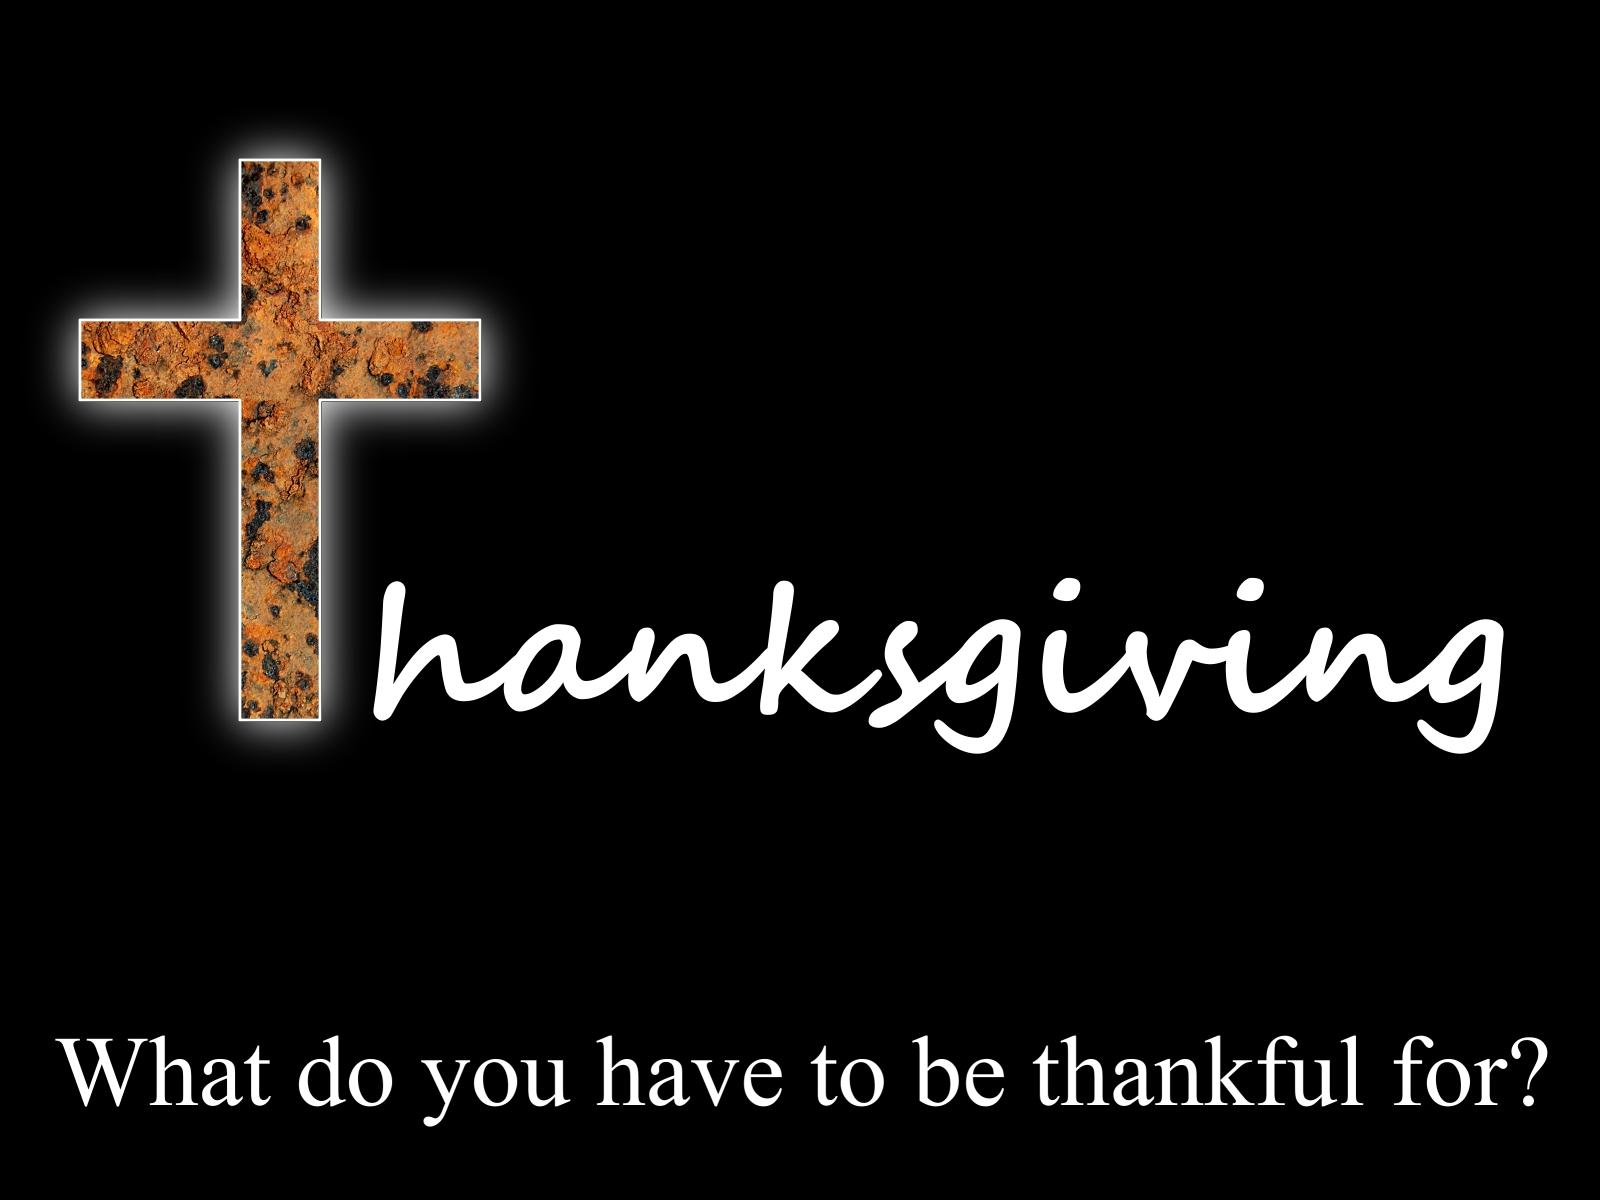 christian thanksgiving screensavers and wallpaper - photo #7